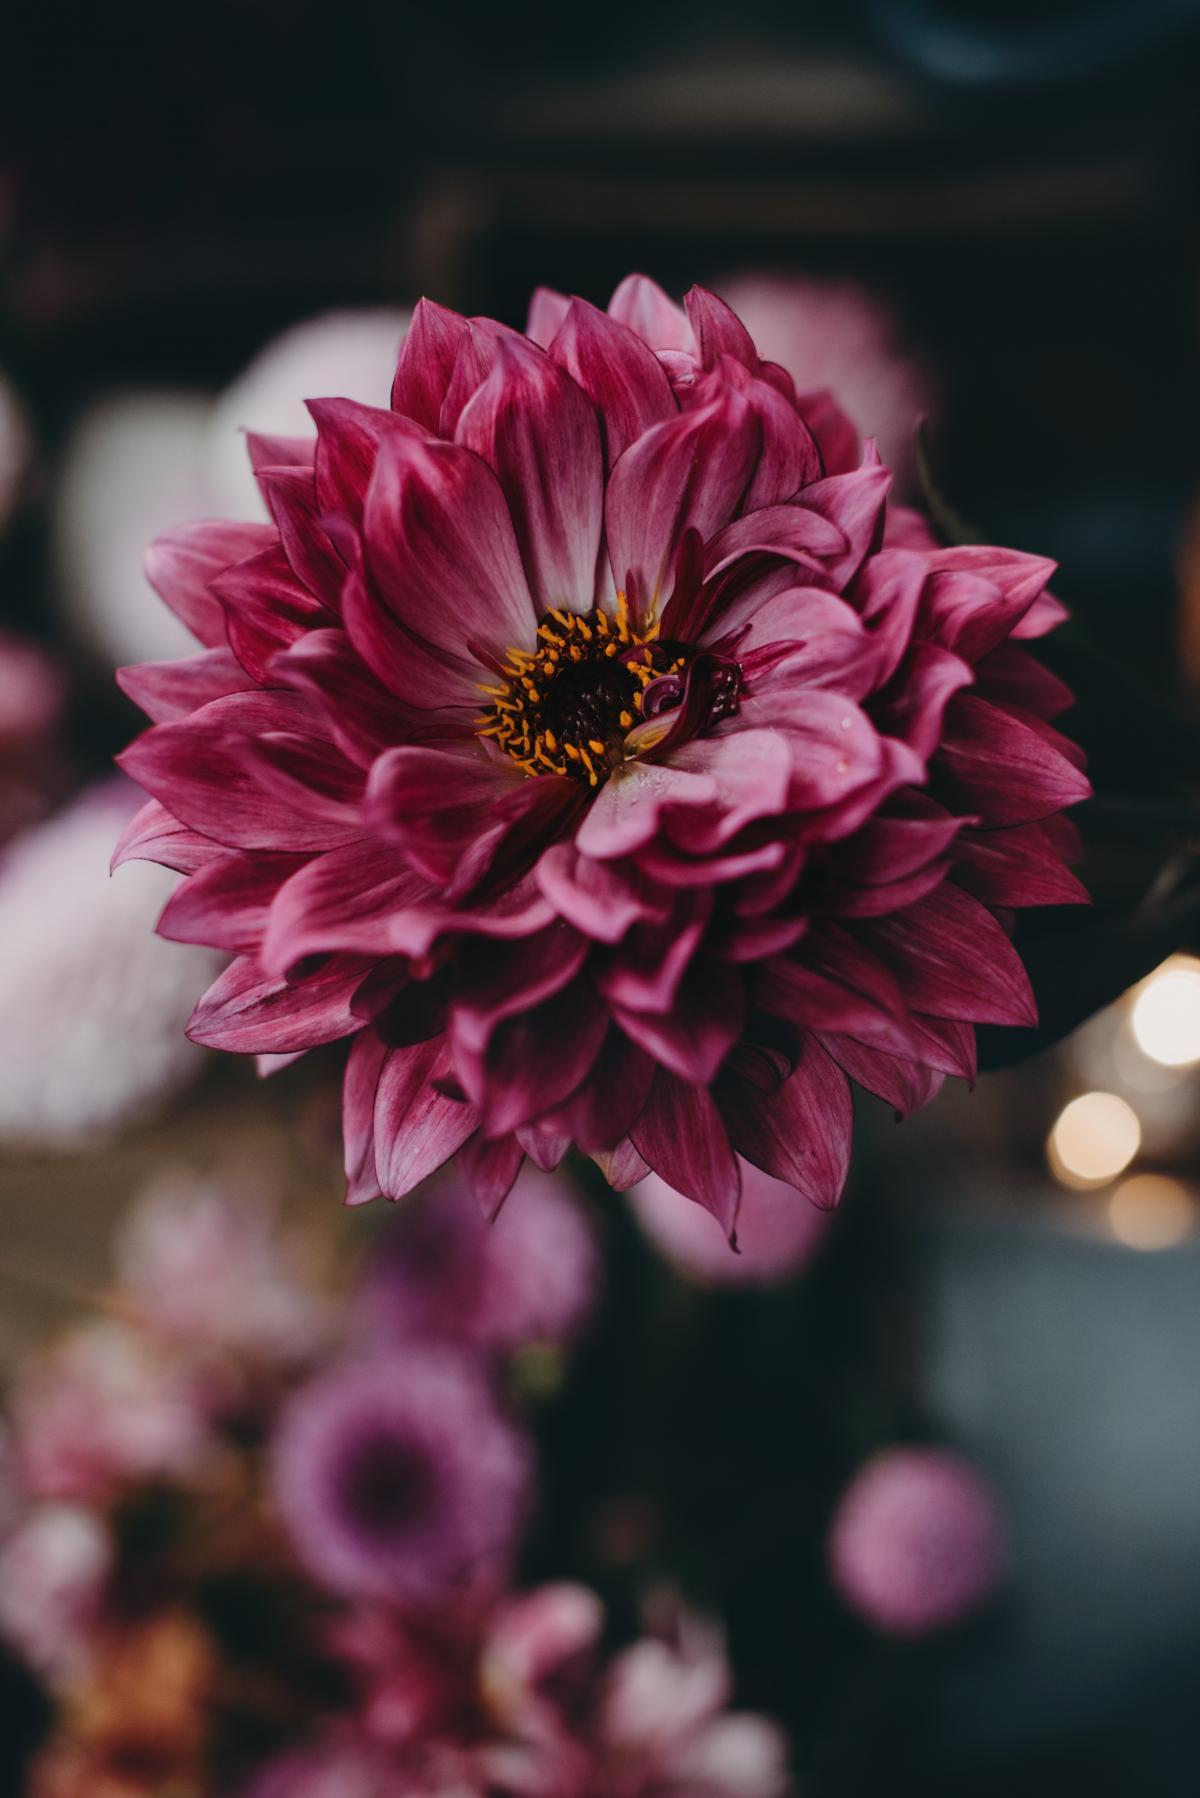 Petal Pink Flower